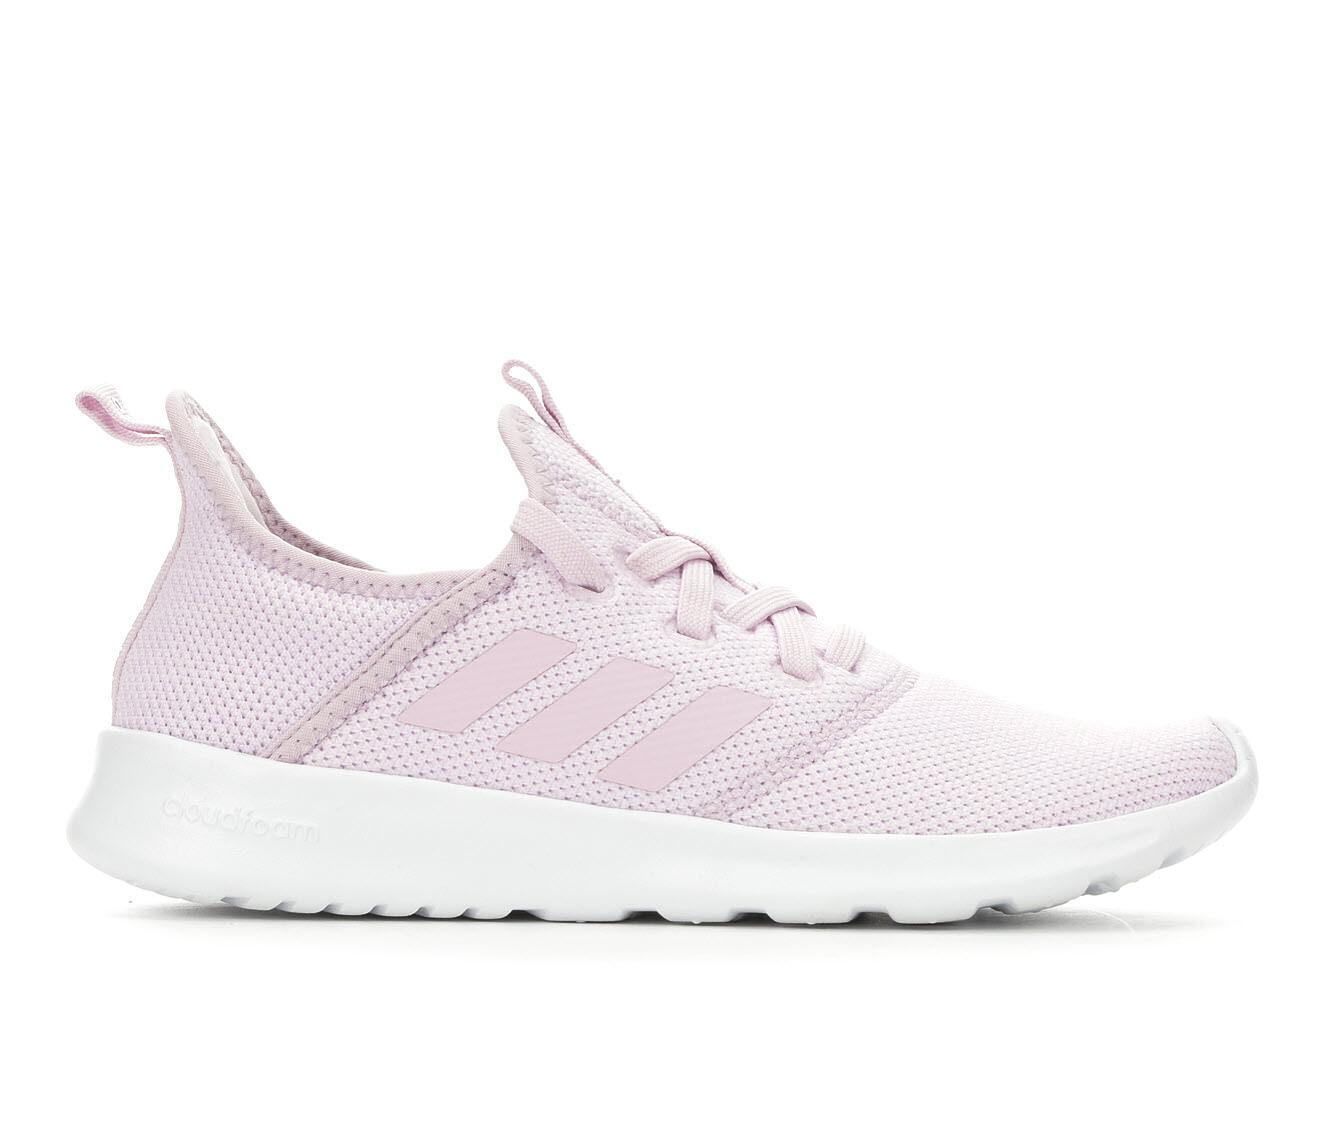 Women's Adidas Pure Sneakers Aero Pink/White